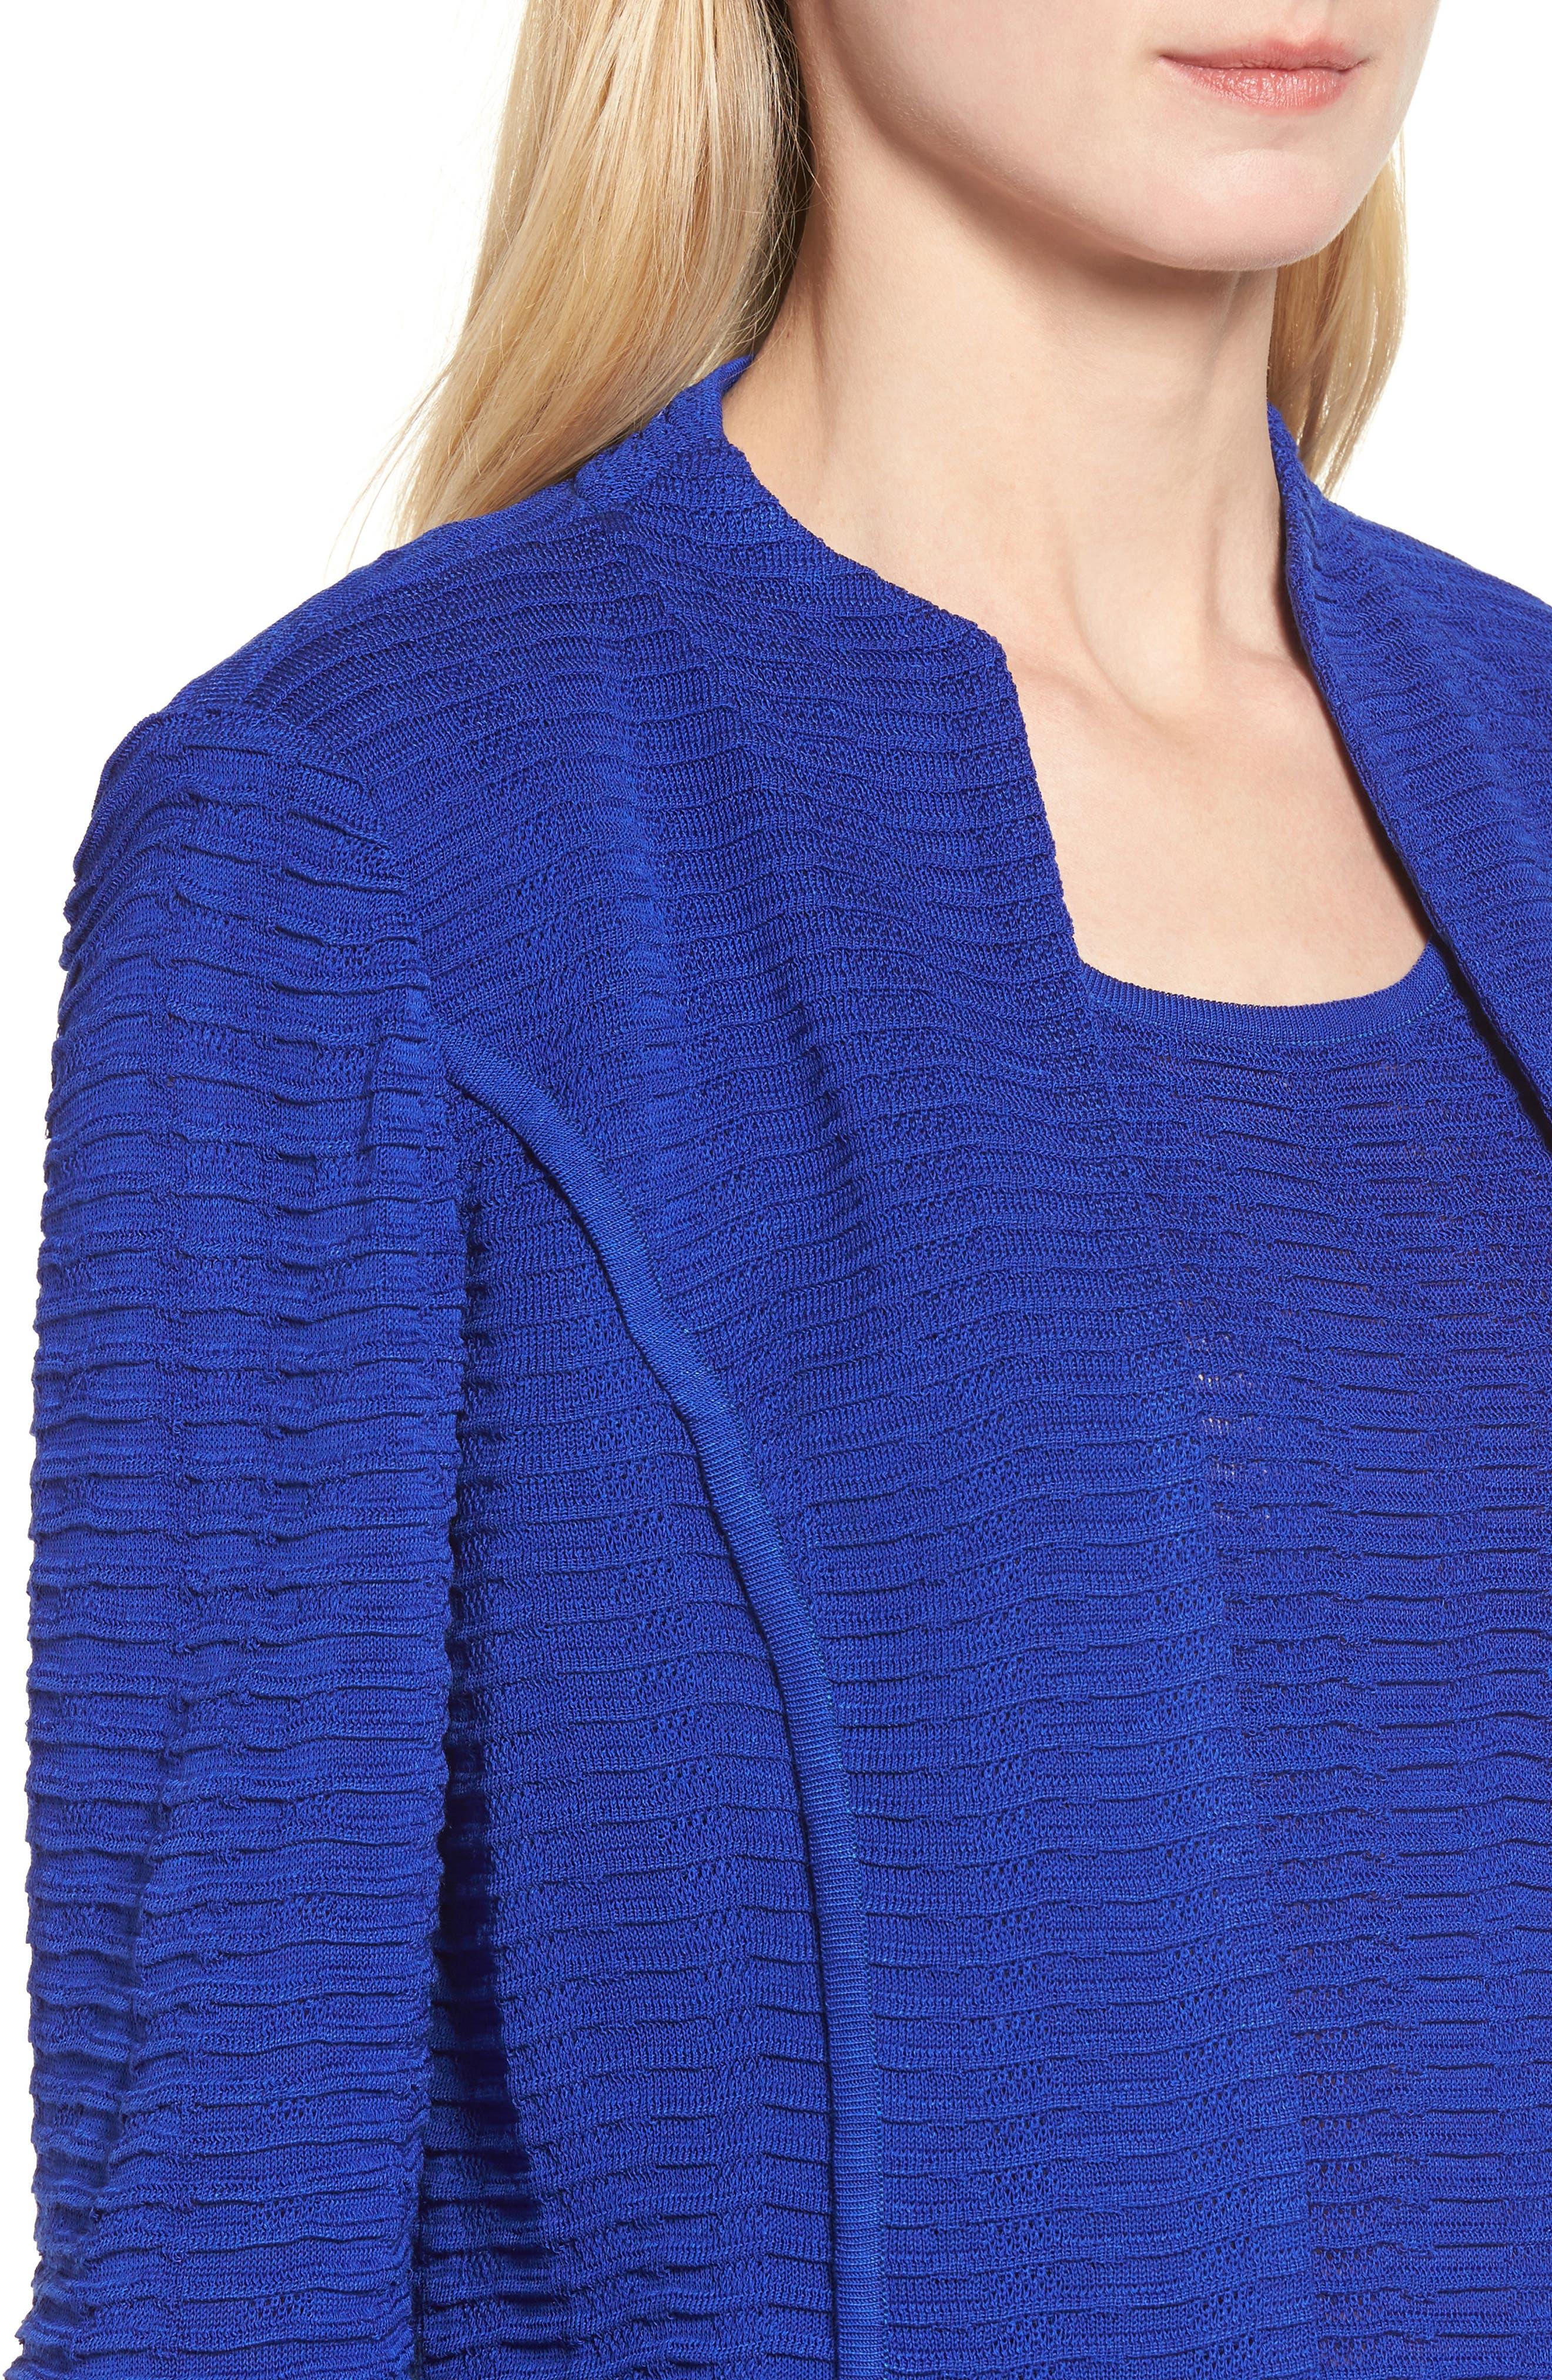 Ripple Knit Jacket,                             Alternate thumbnail 4, color,                             Blue Flame